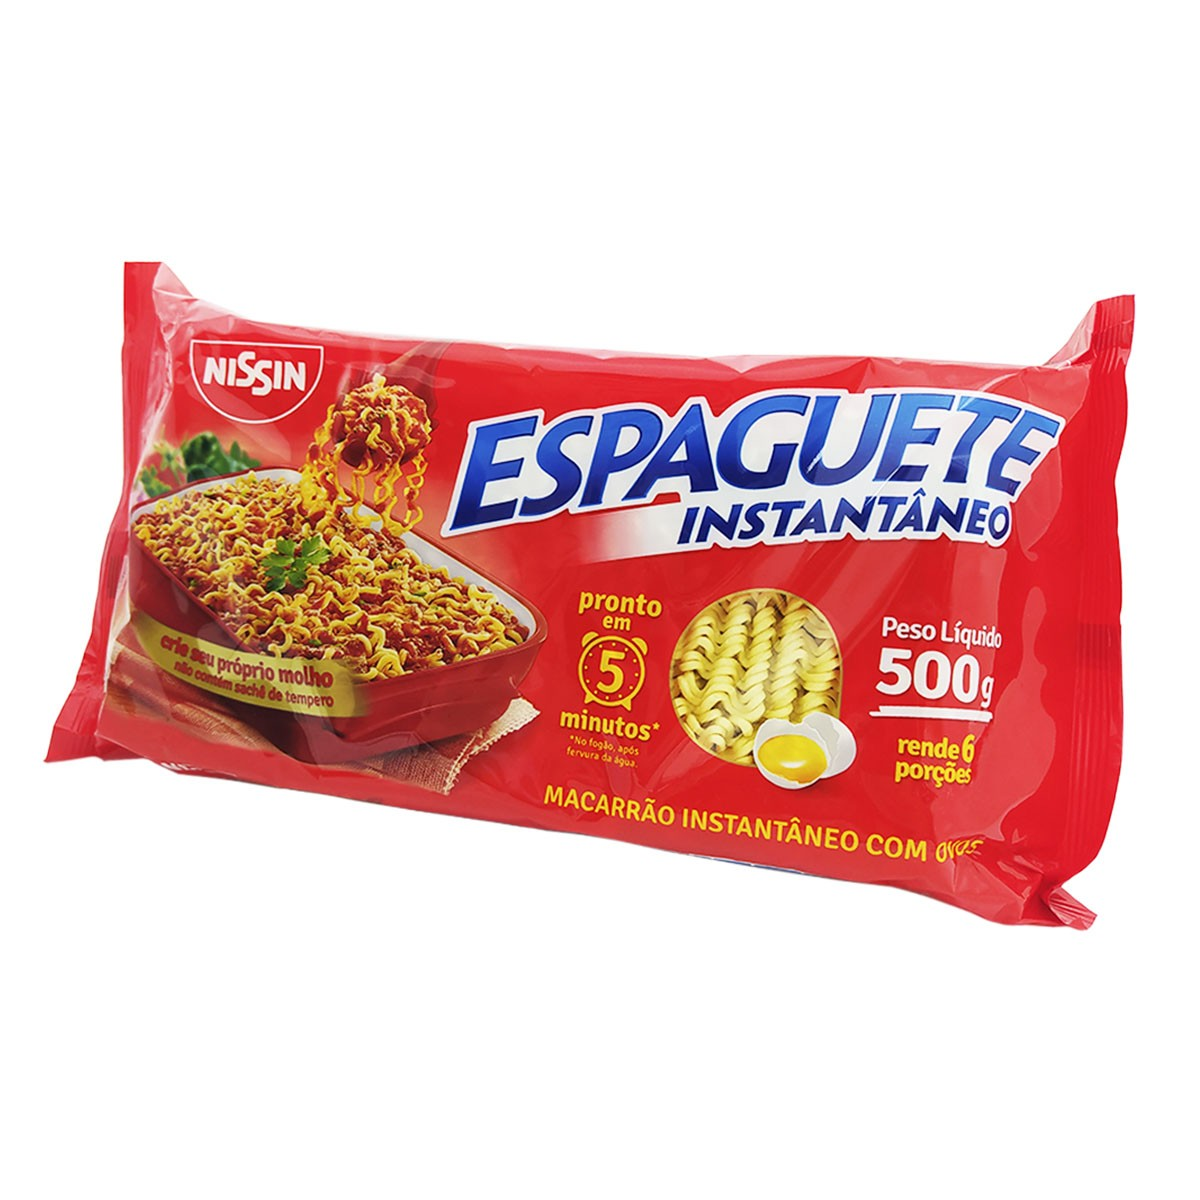 Espaguete Instantâneo 500g - Nissin